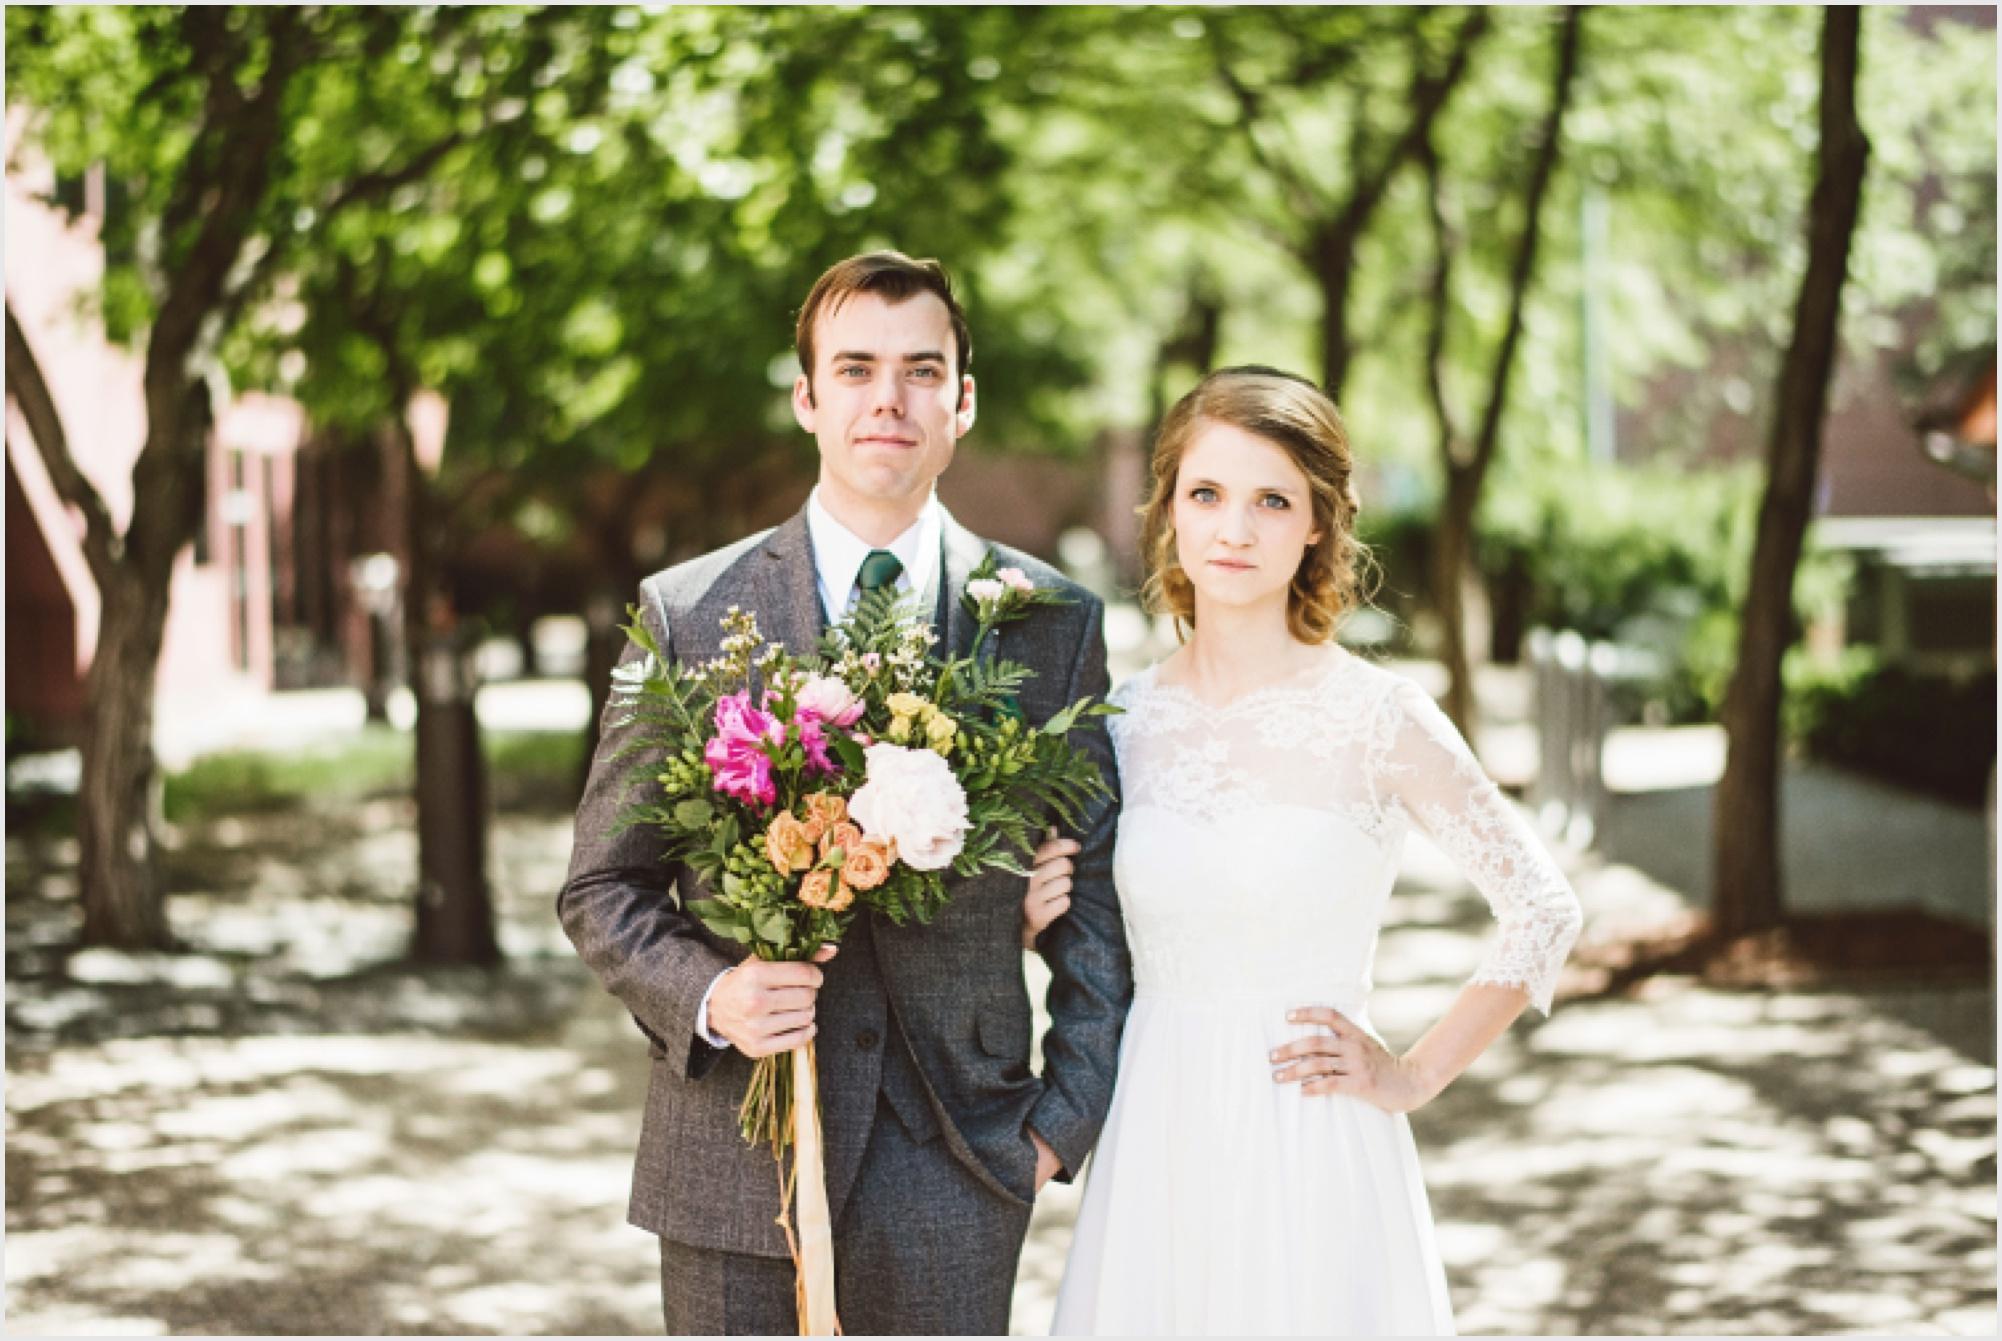 abby_taylor_minneapolis_wedding_lucas_botz_photography_143.jpg